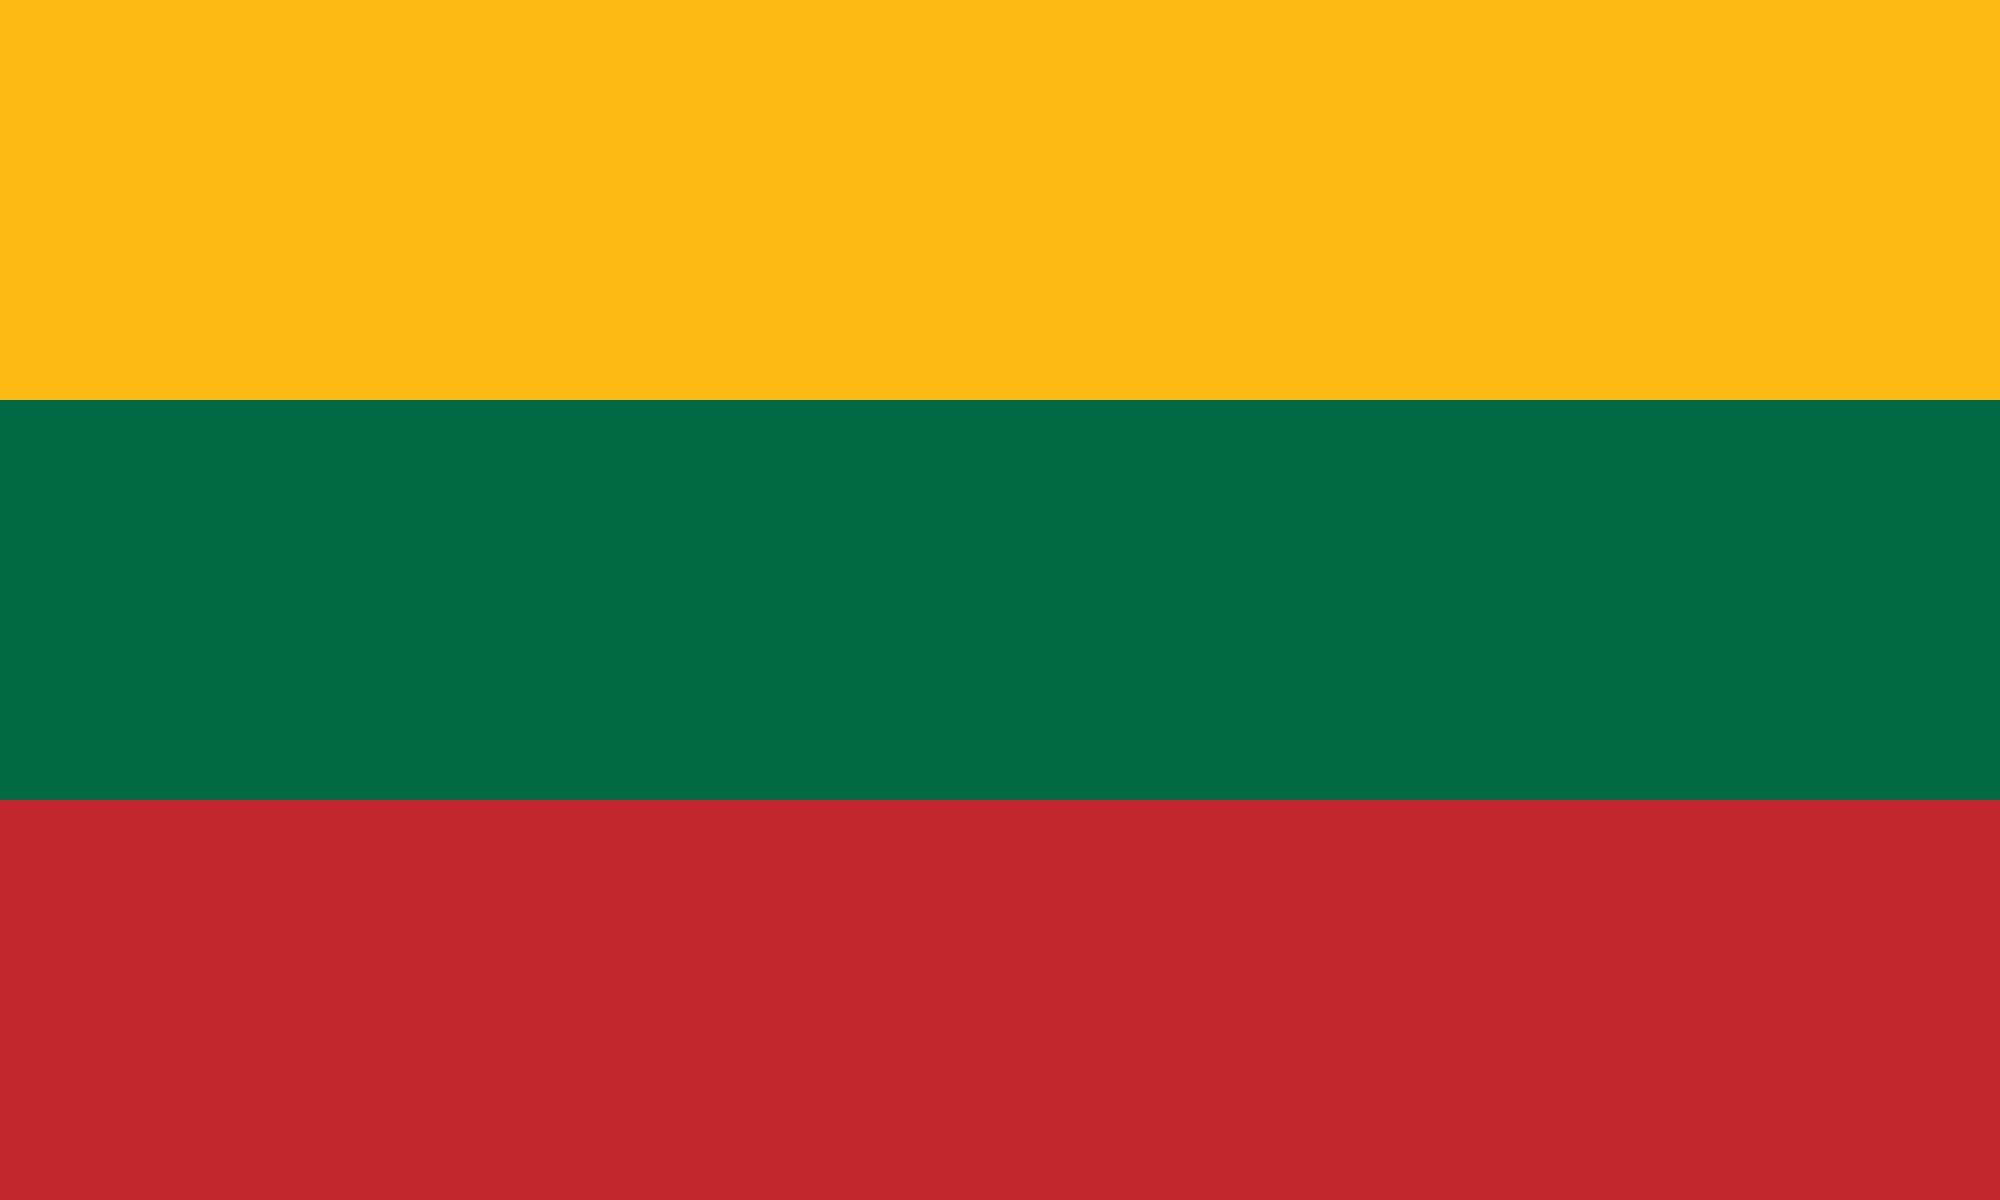 National Flag of Lithuania